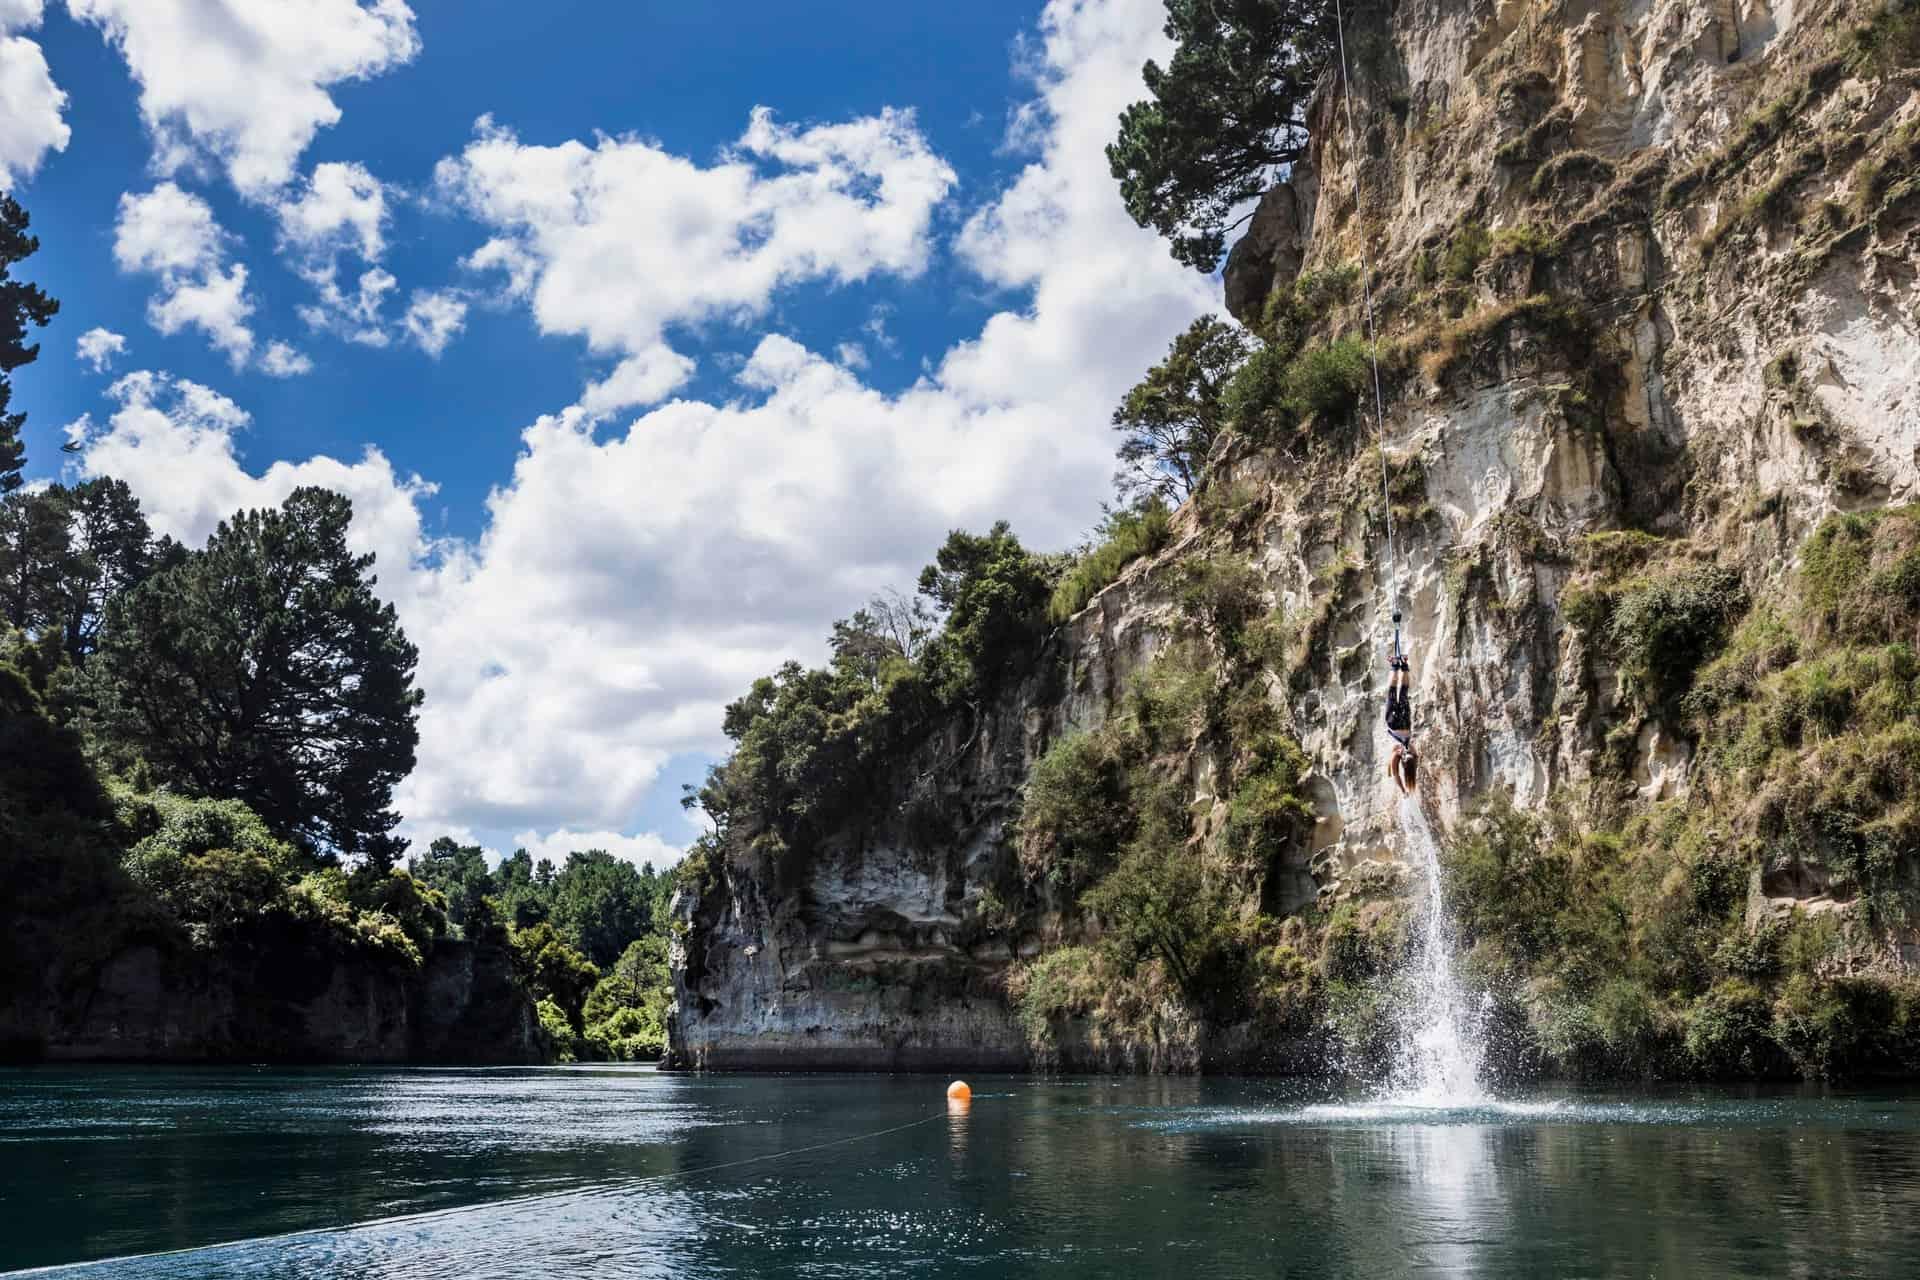 Taupo Bungee Jumping Neuseeland Ozeanien Tours